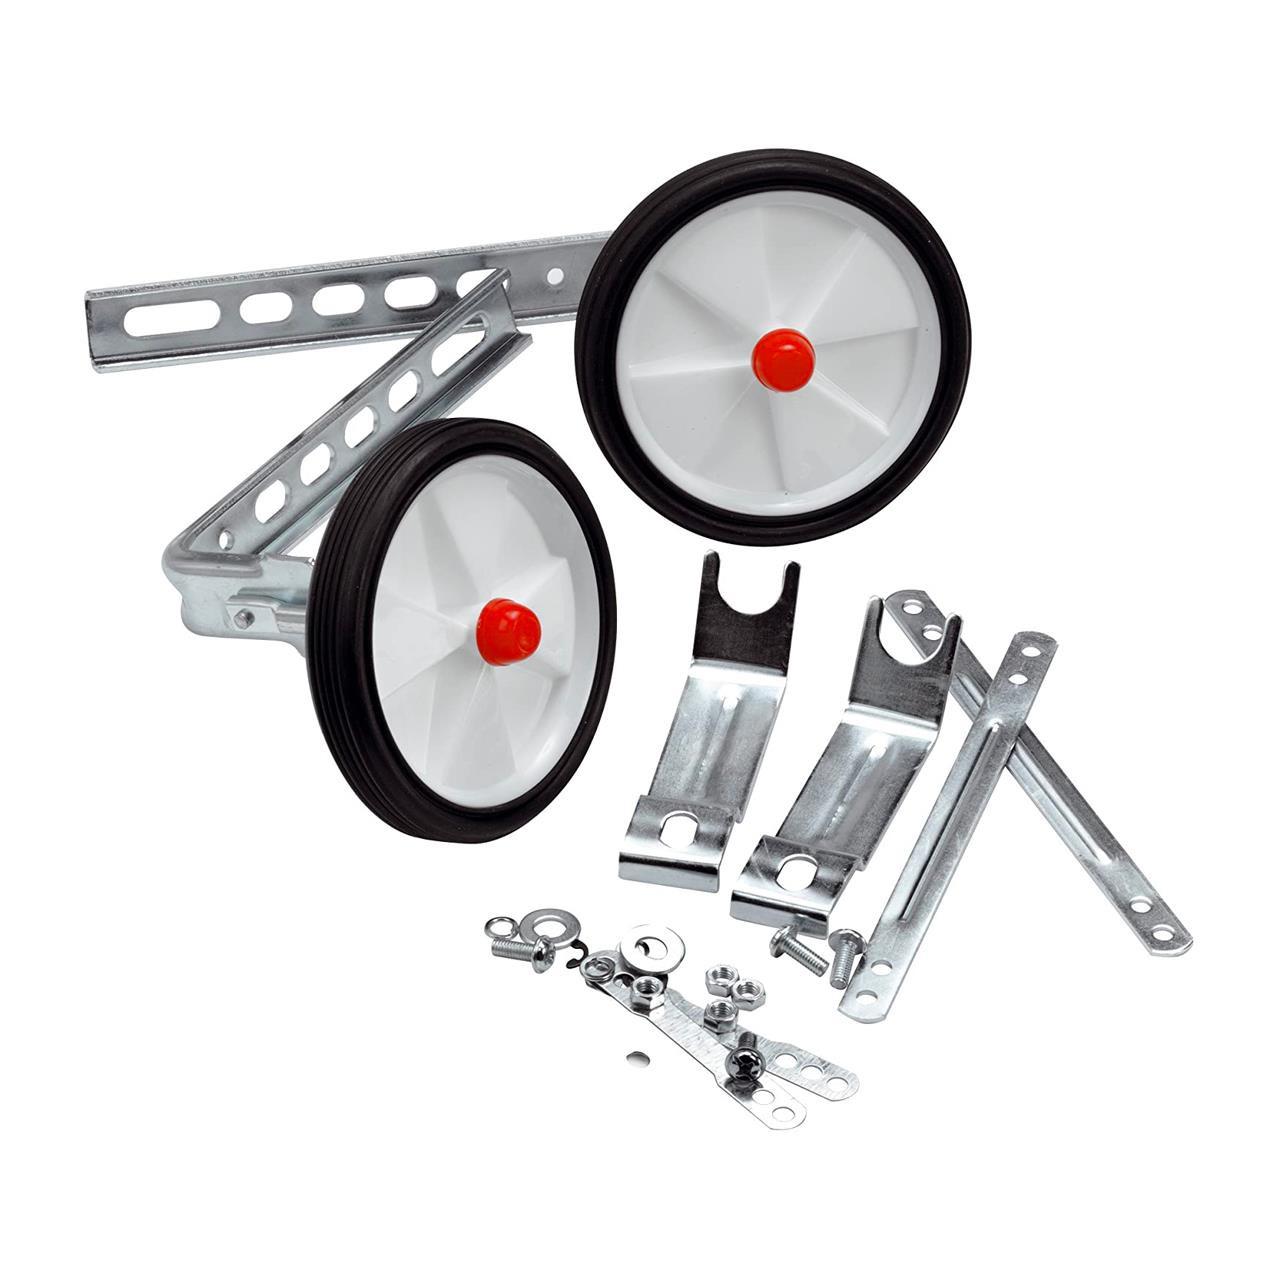 Raleigh Stabilisers (Silver, 12/16 Inch Wheel)